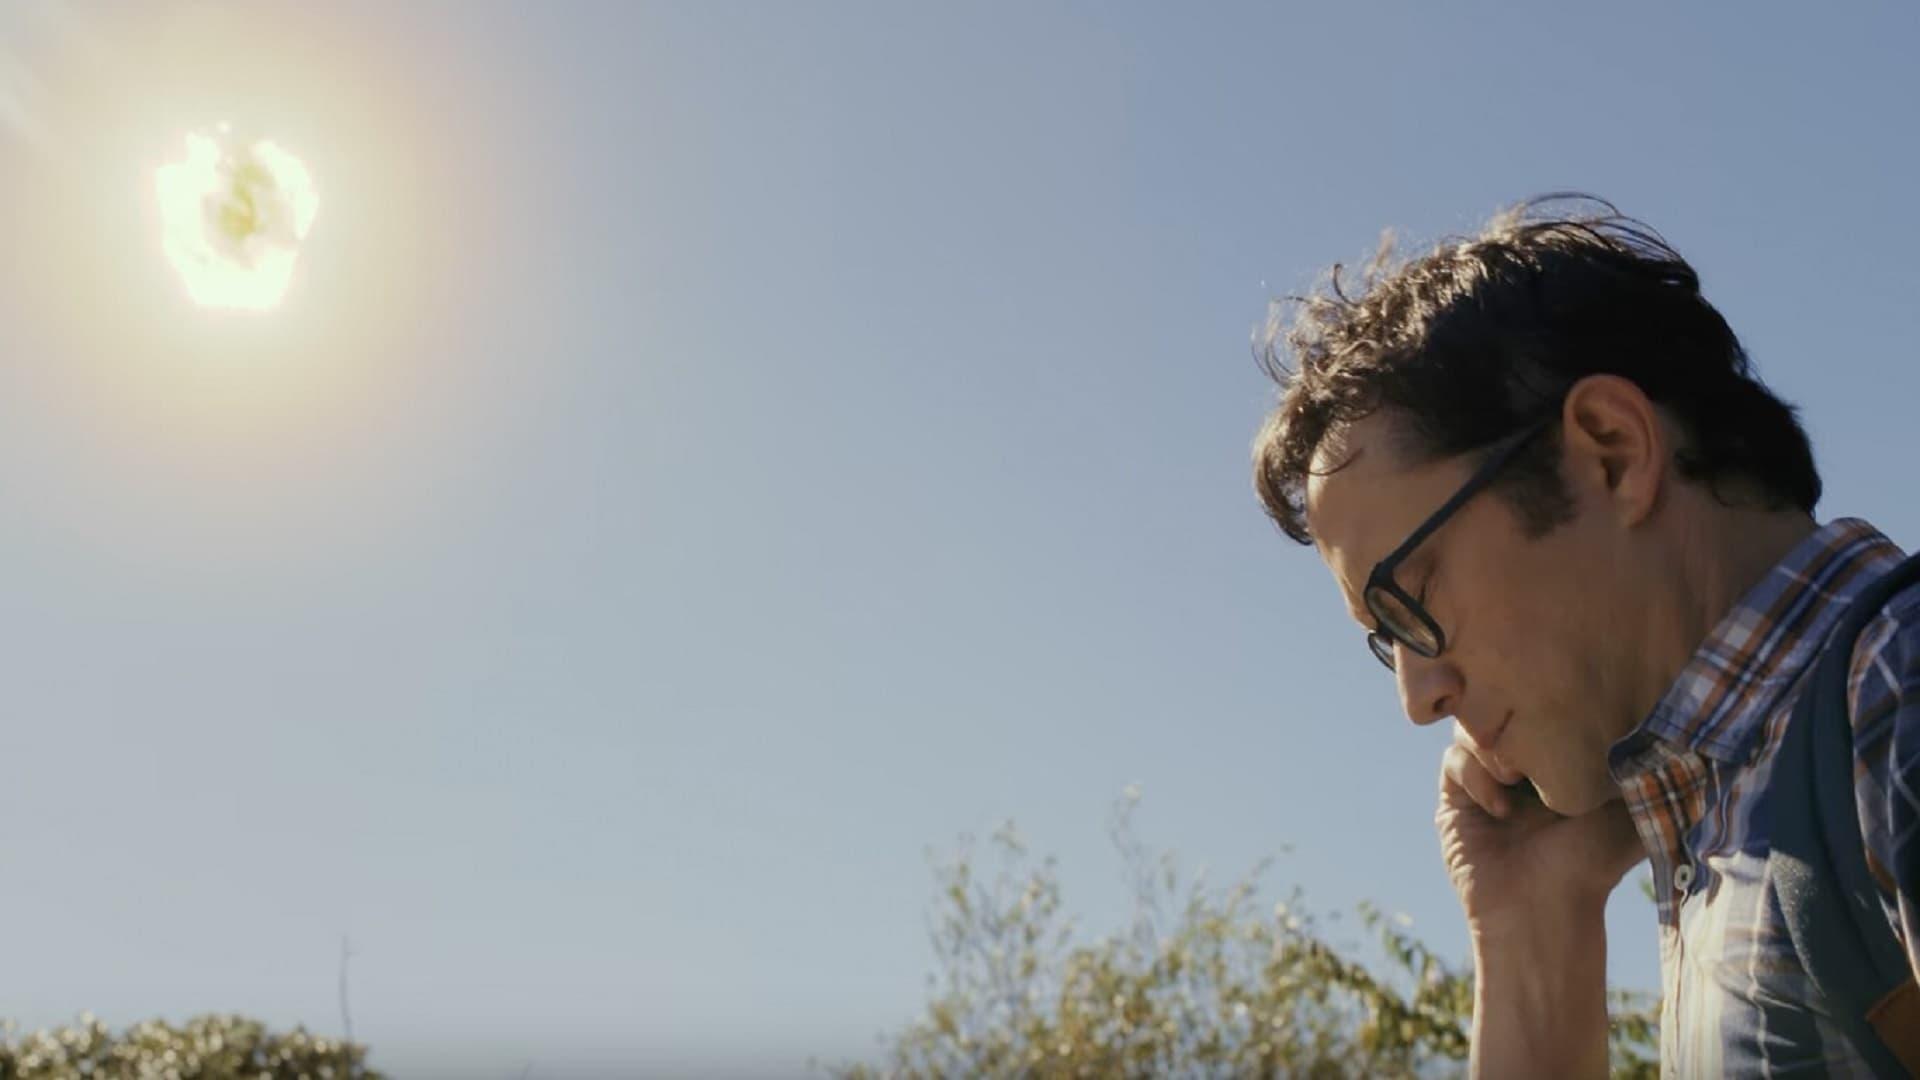 Agosto en Apple TV Plus: llega la nueva comedia Mr. Corman